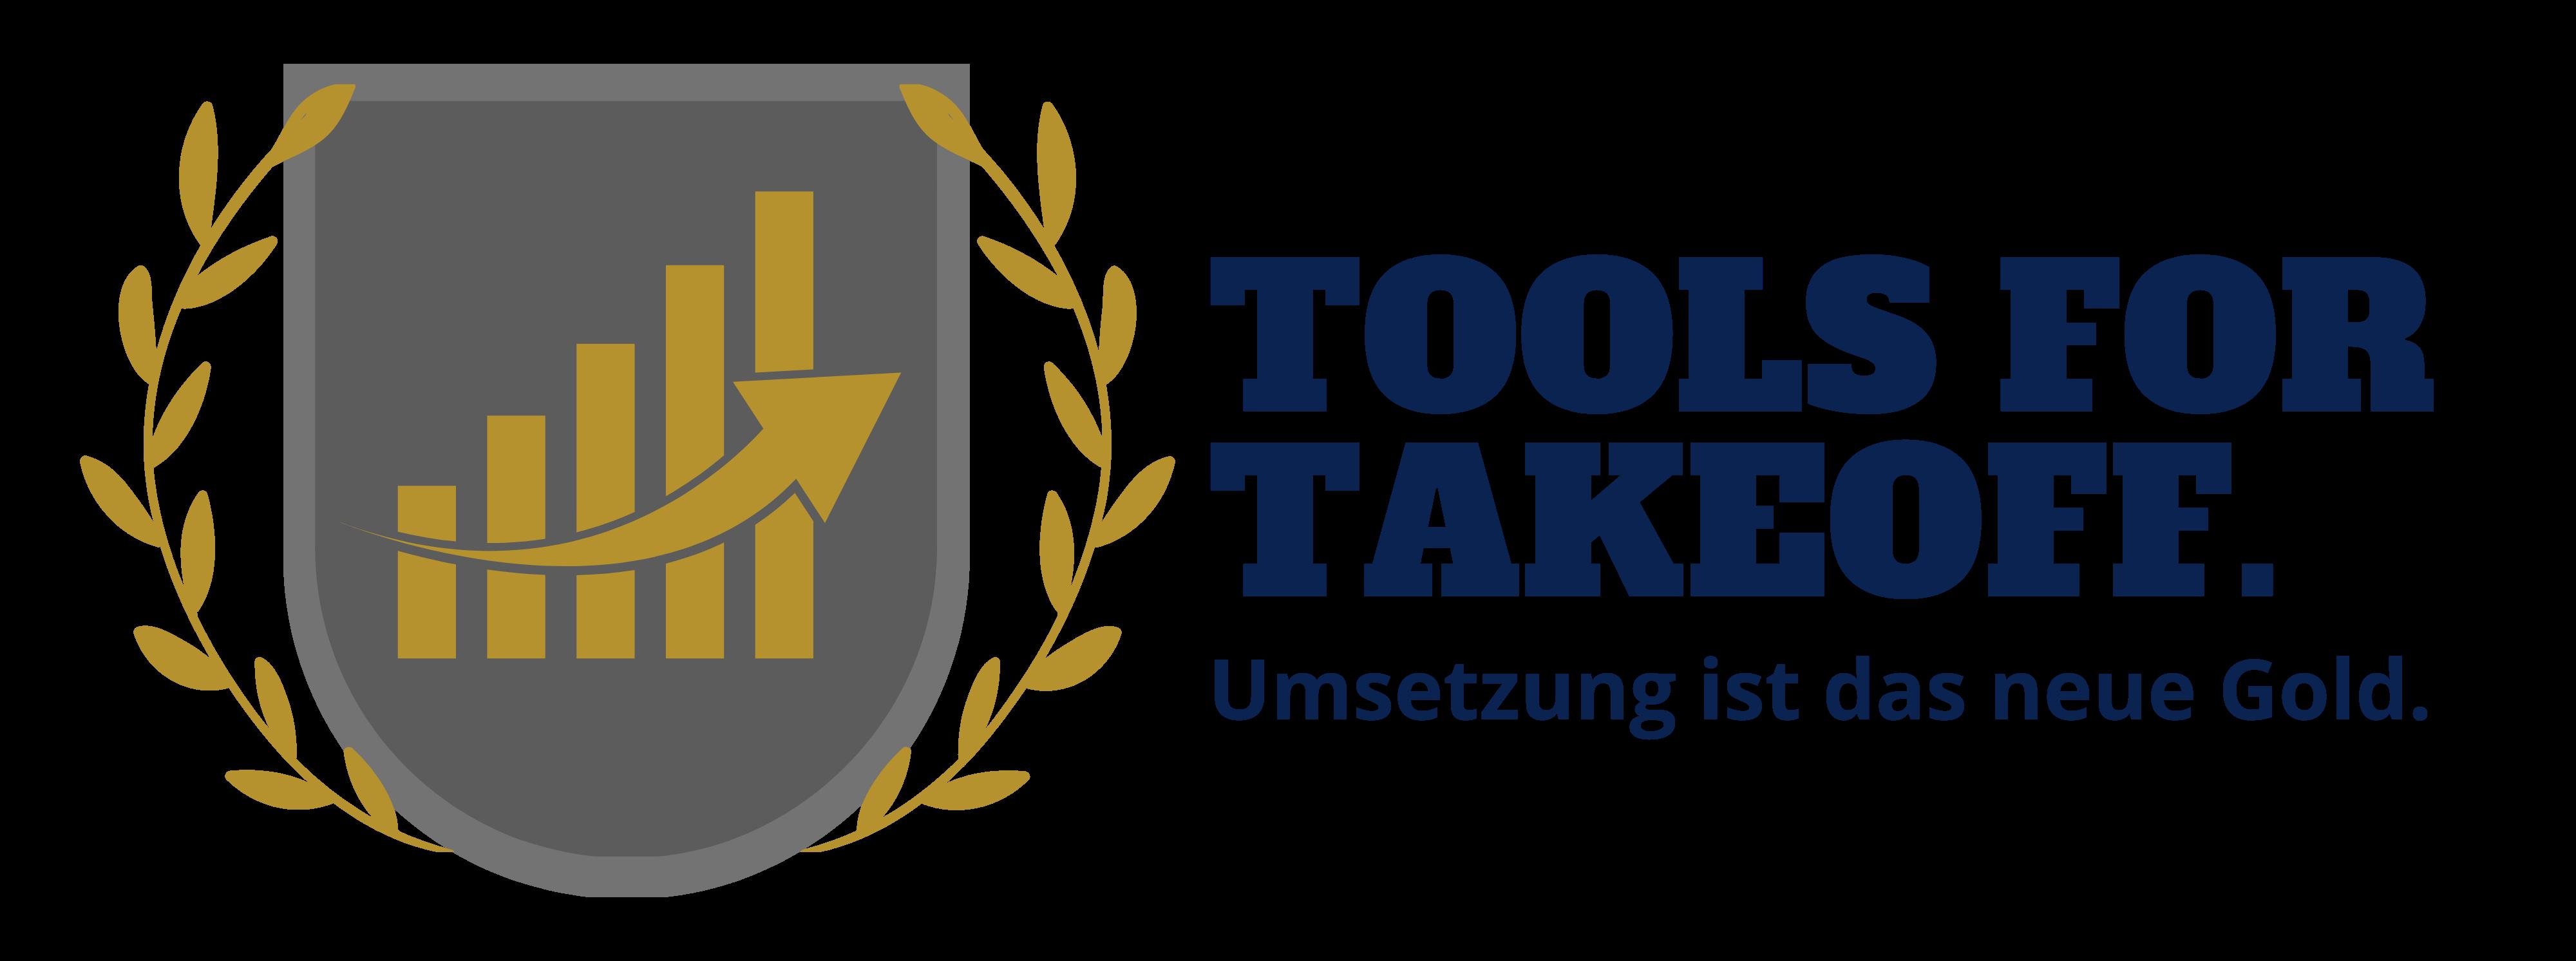 toolsfortakeoff.com